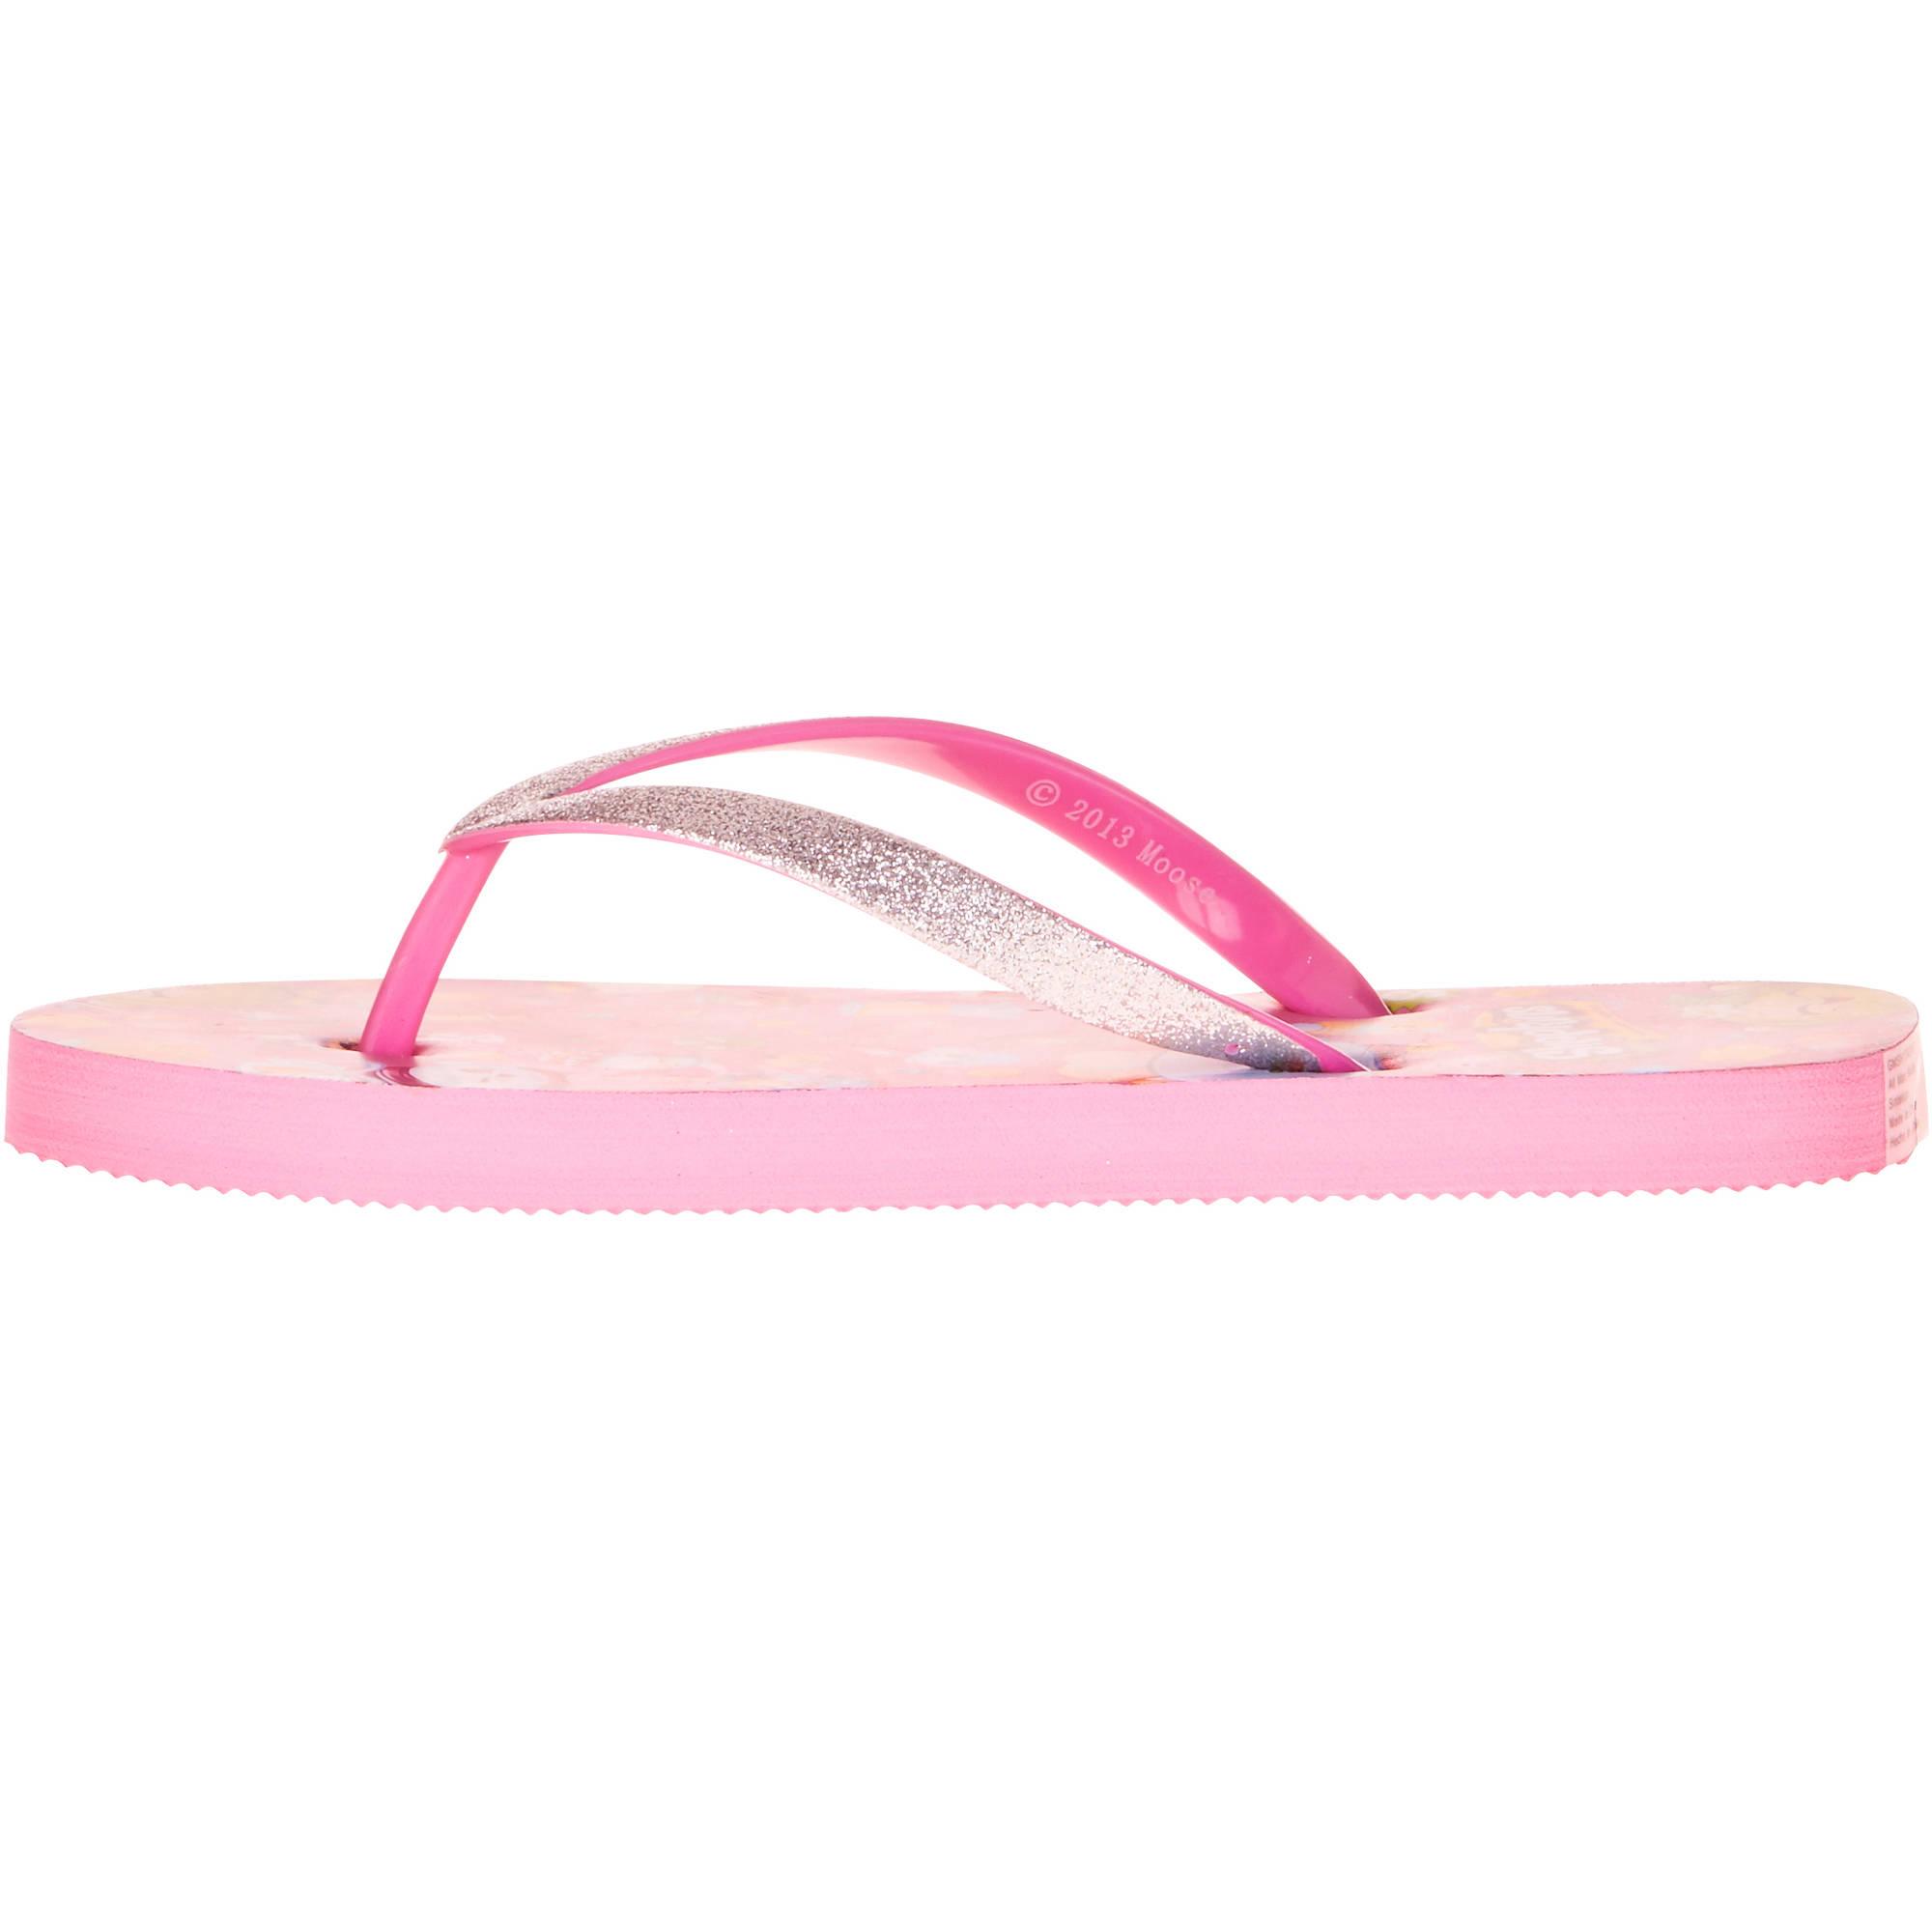 Girls Flip Flop Economical, stylish, and eye-catching shoes